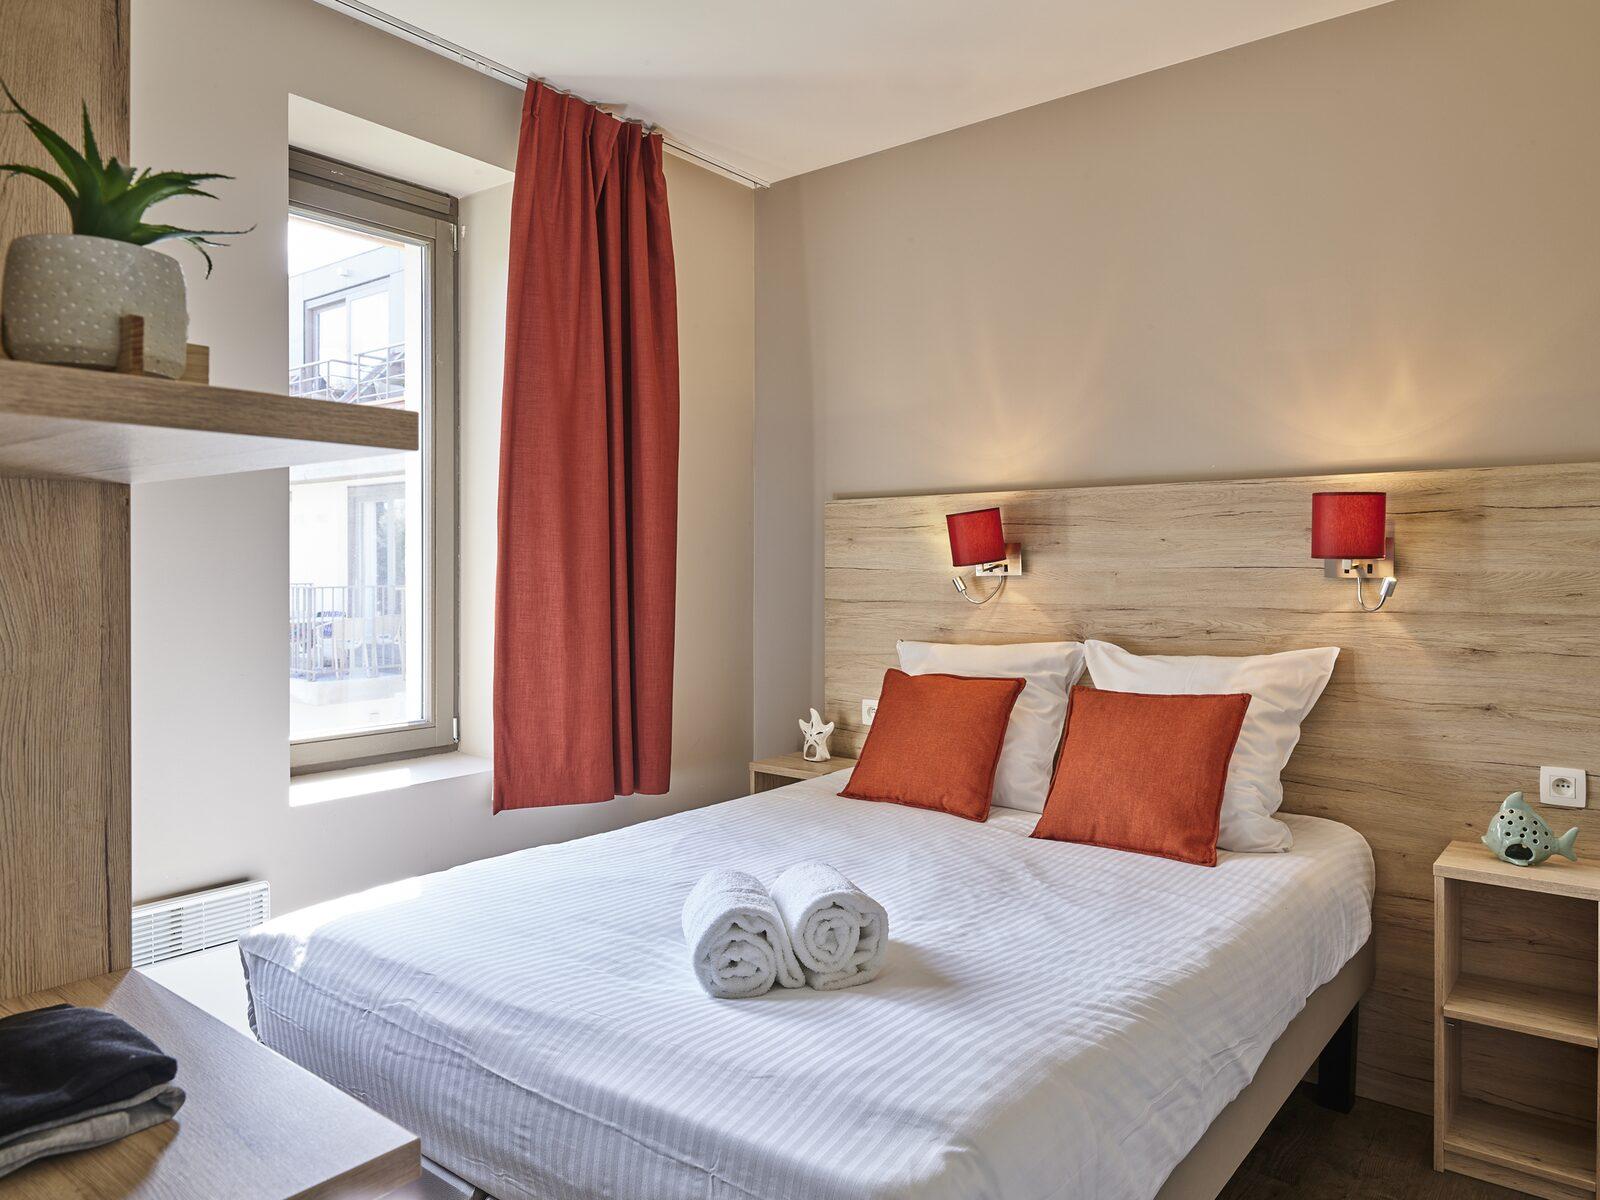 Comfort Suite - 7p | 2 Chambres à coucher - Coin couchage